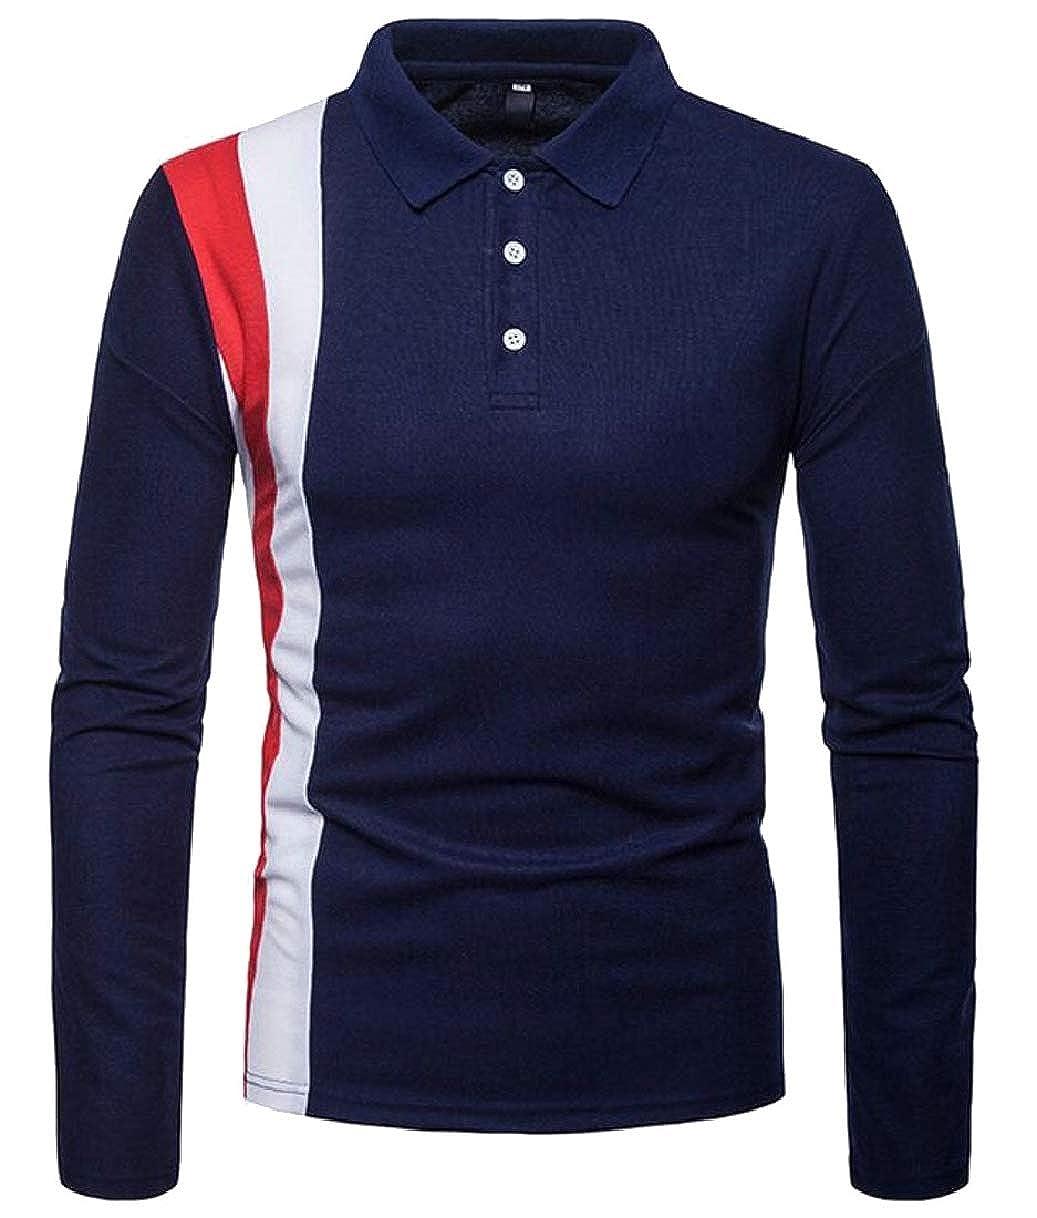 CBTLVSN Mens Polo Shirt Casual Long Sleeve Classic Fashion Sport Polo Shirt